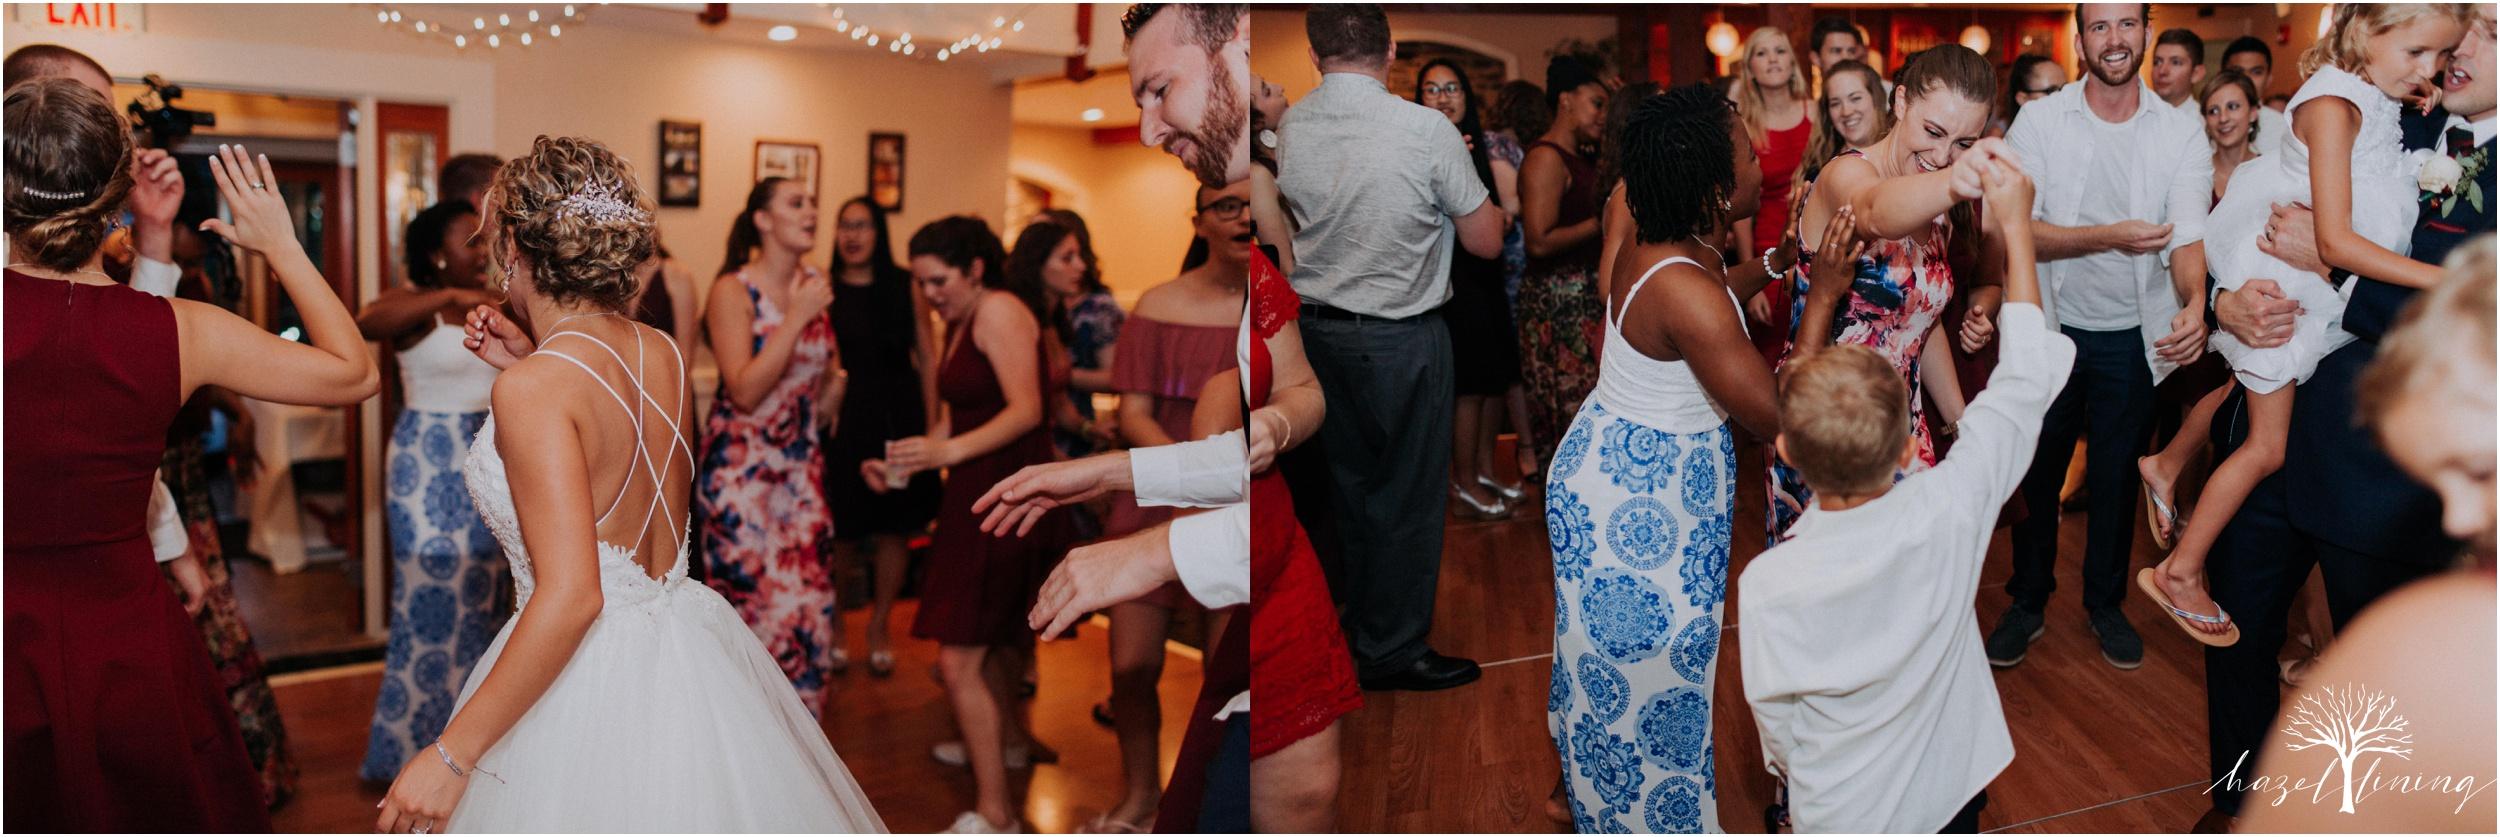 jonathan-weibel-becky-haywood-loft-at-sweetwater-cc-pennsburg-pennsylvania-rainy-day-summer-wedding-hazel-lining-travel-wedding-elopement-photography_0144.jpg